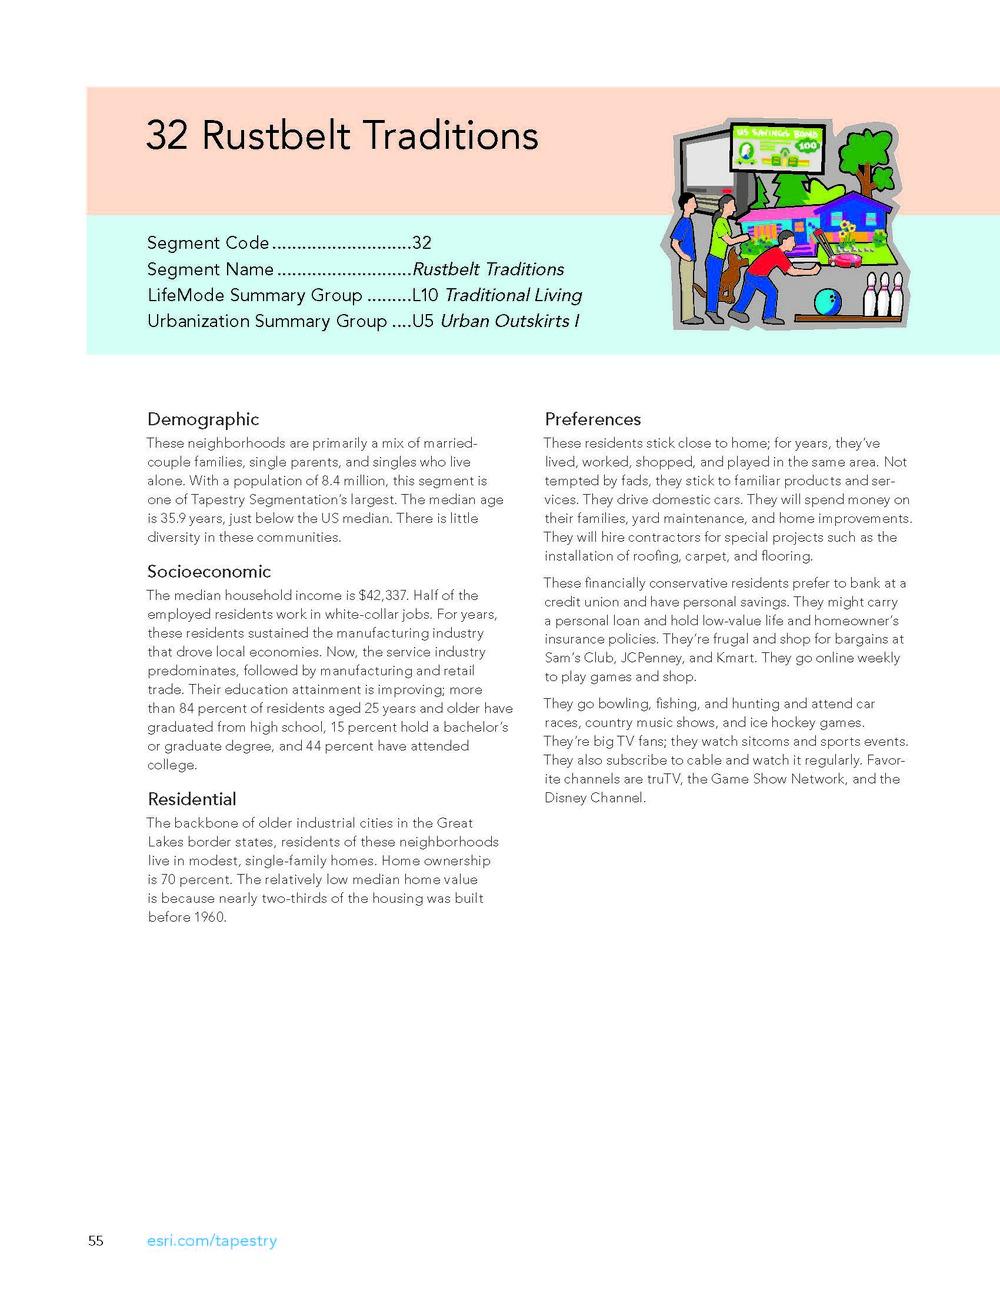 tapestry-segmentation_Page_58.jpg